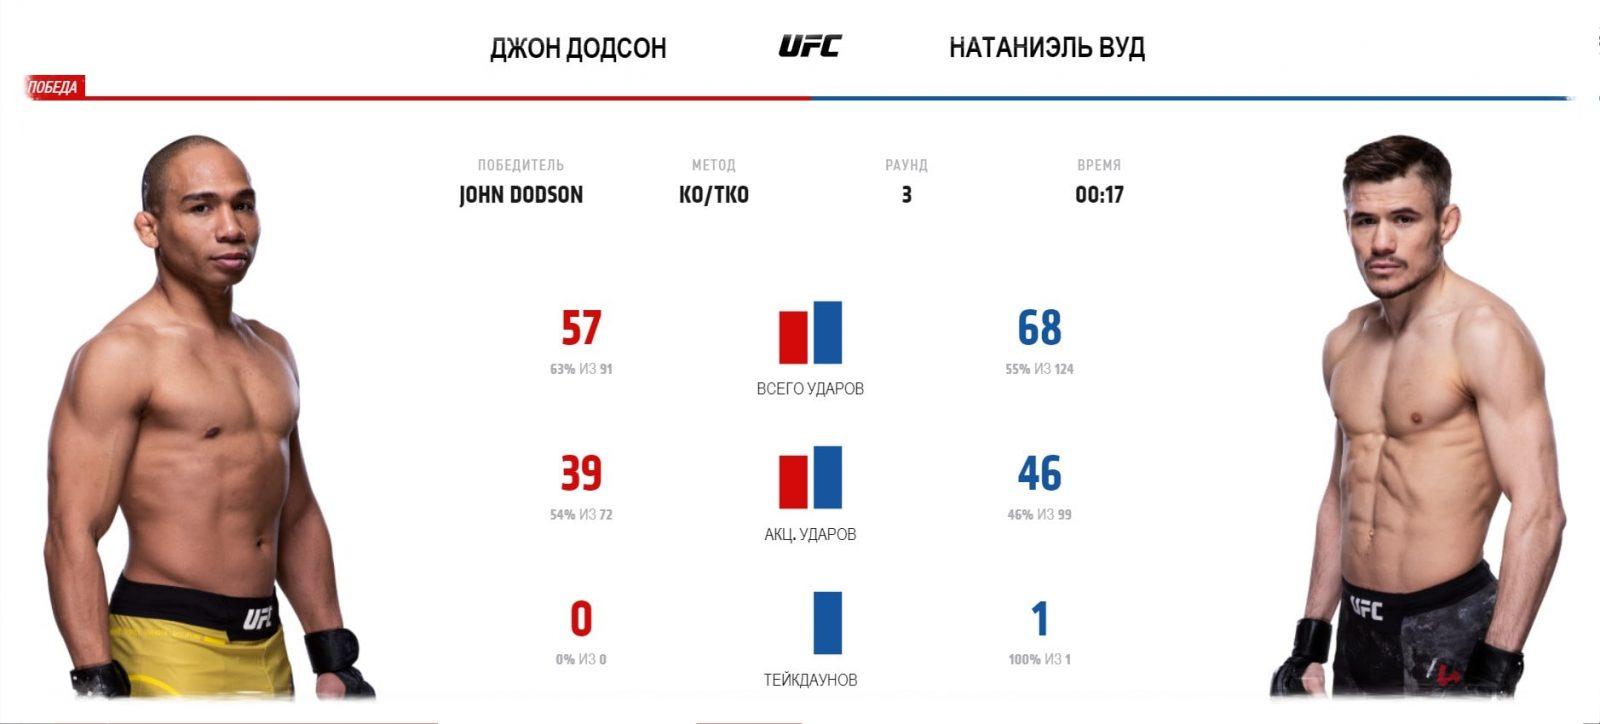 video-boya-dzhon-dodson-nataniehl-vud-john-dodson-nathaniel-wood-ufc-fight-night-167